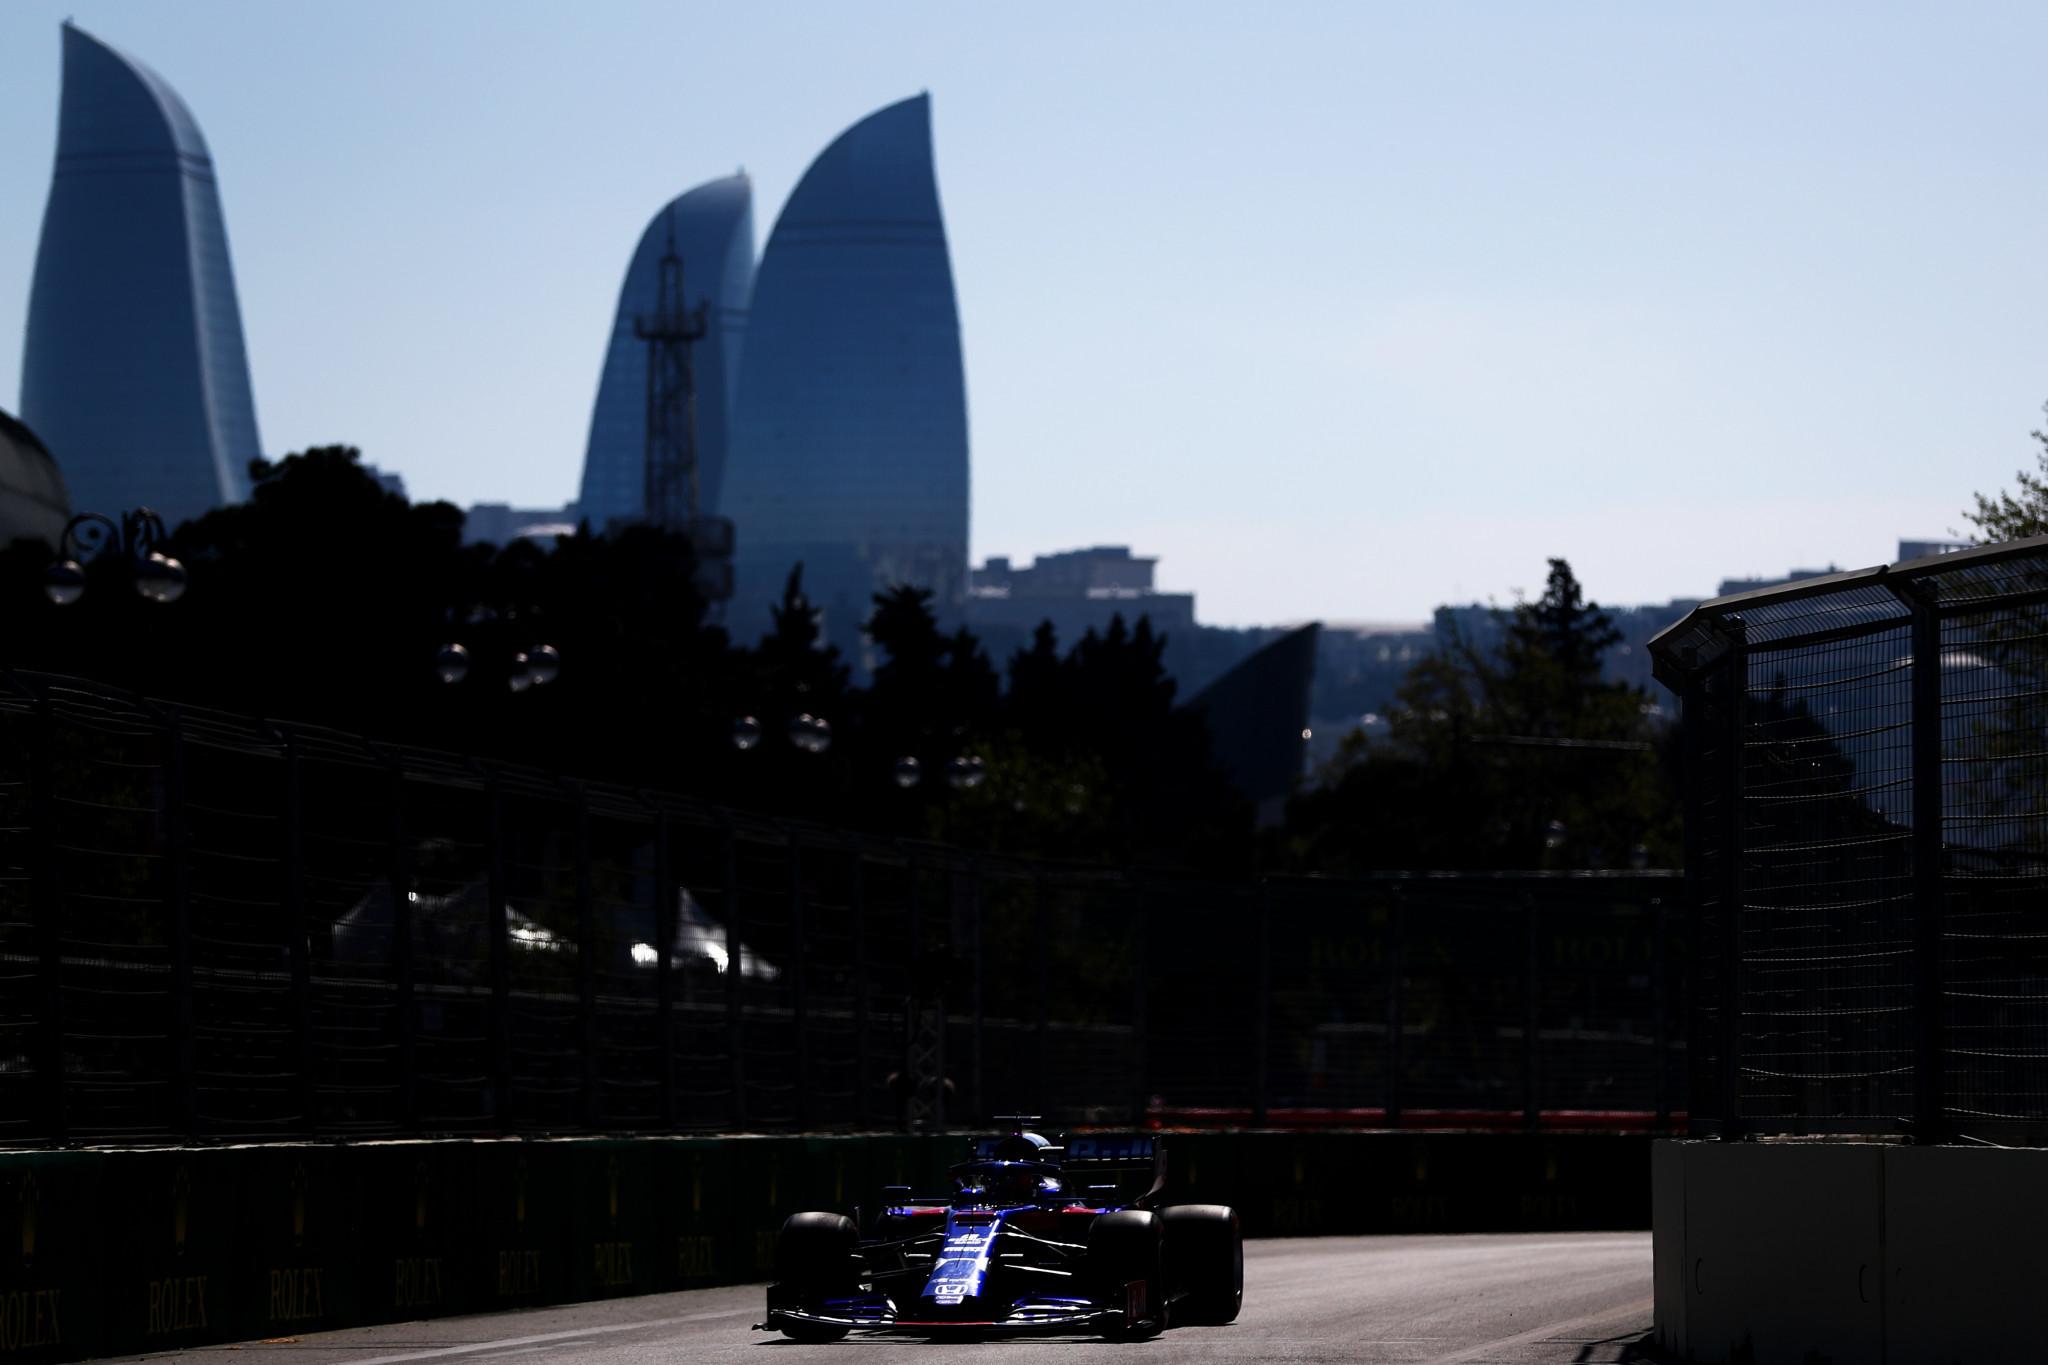 Formula One Grand Prix in Baku postponed due to coronavirus pandemic